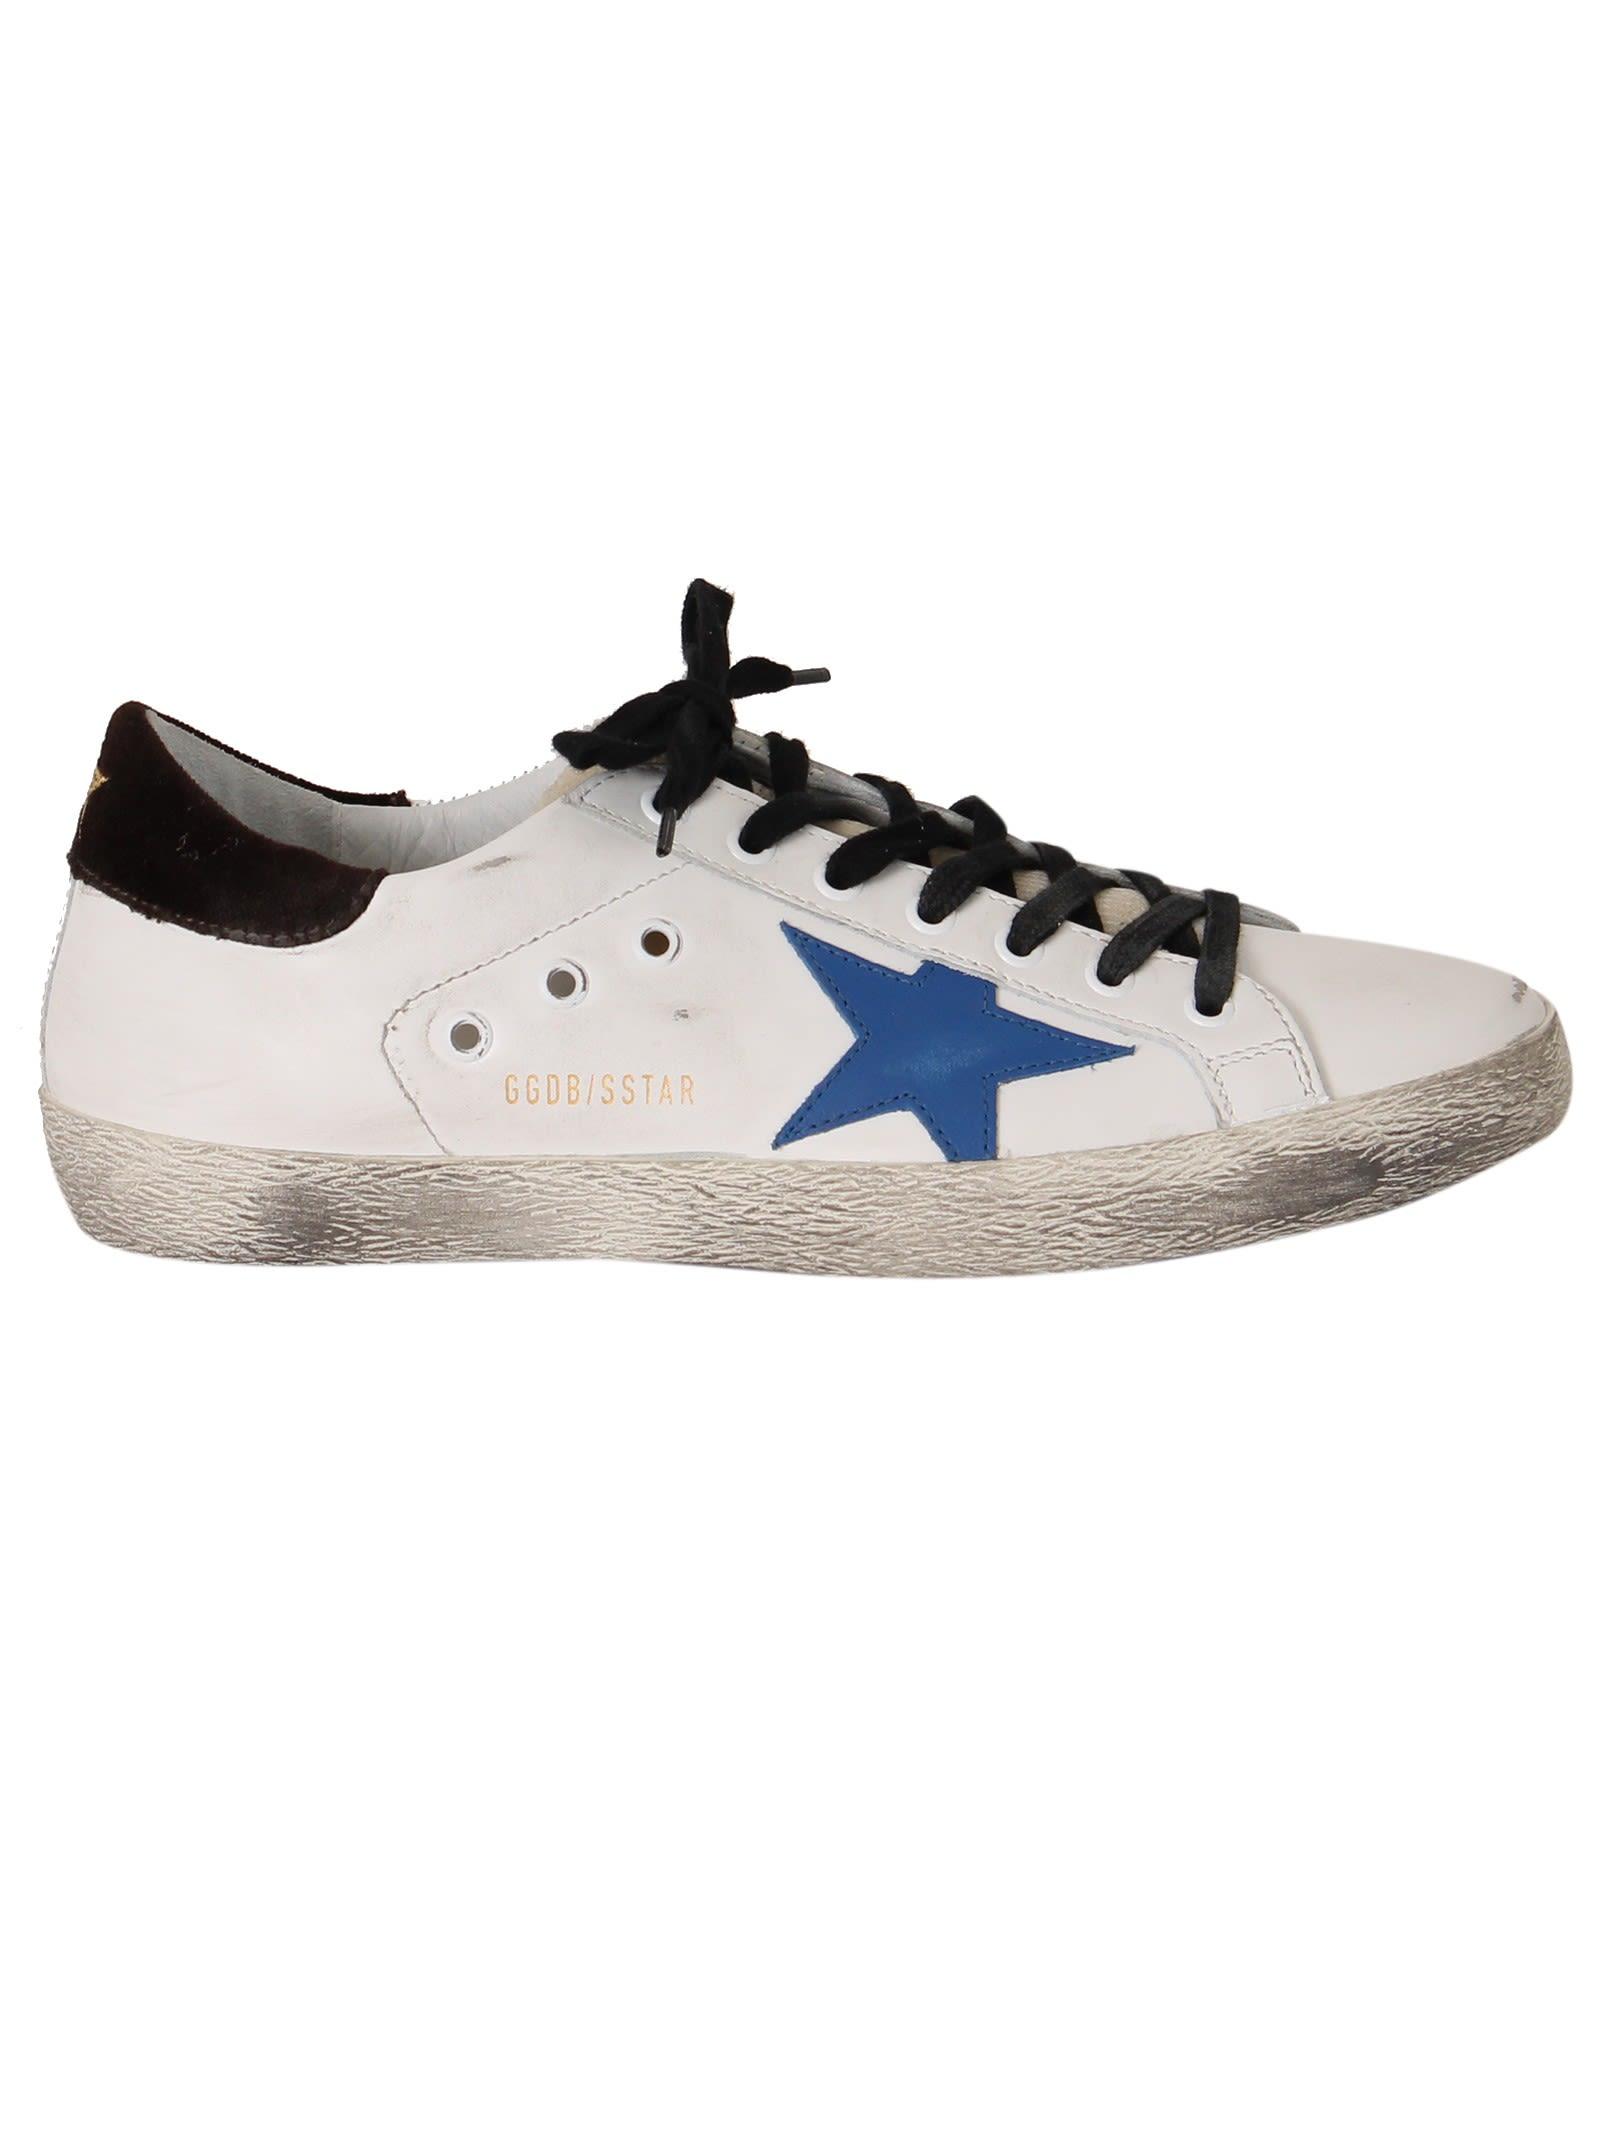 Golden Goose White Bluette Superstar Sneakers